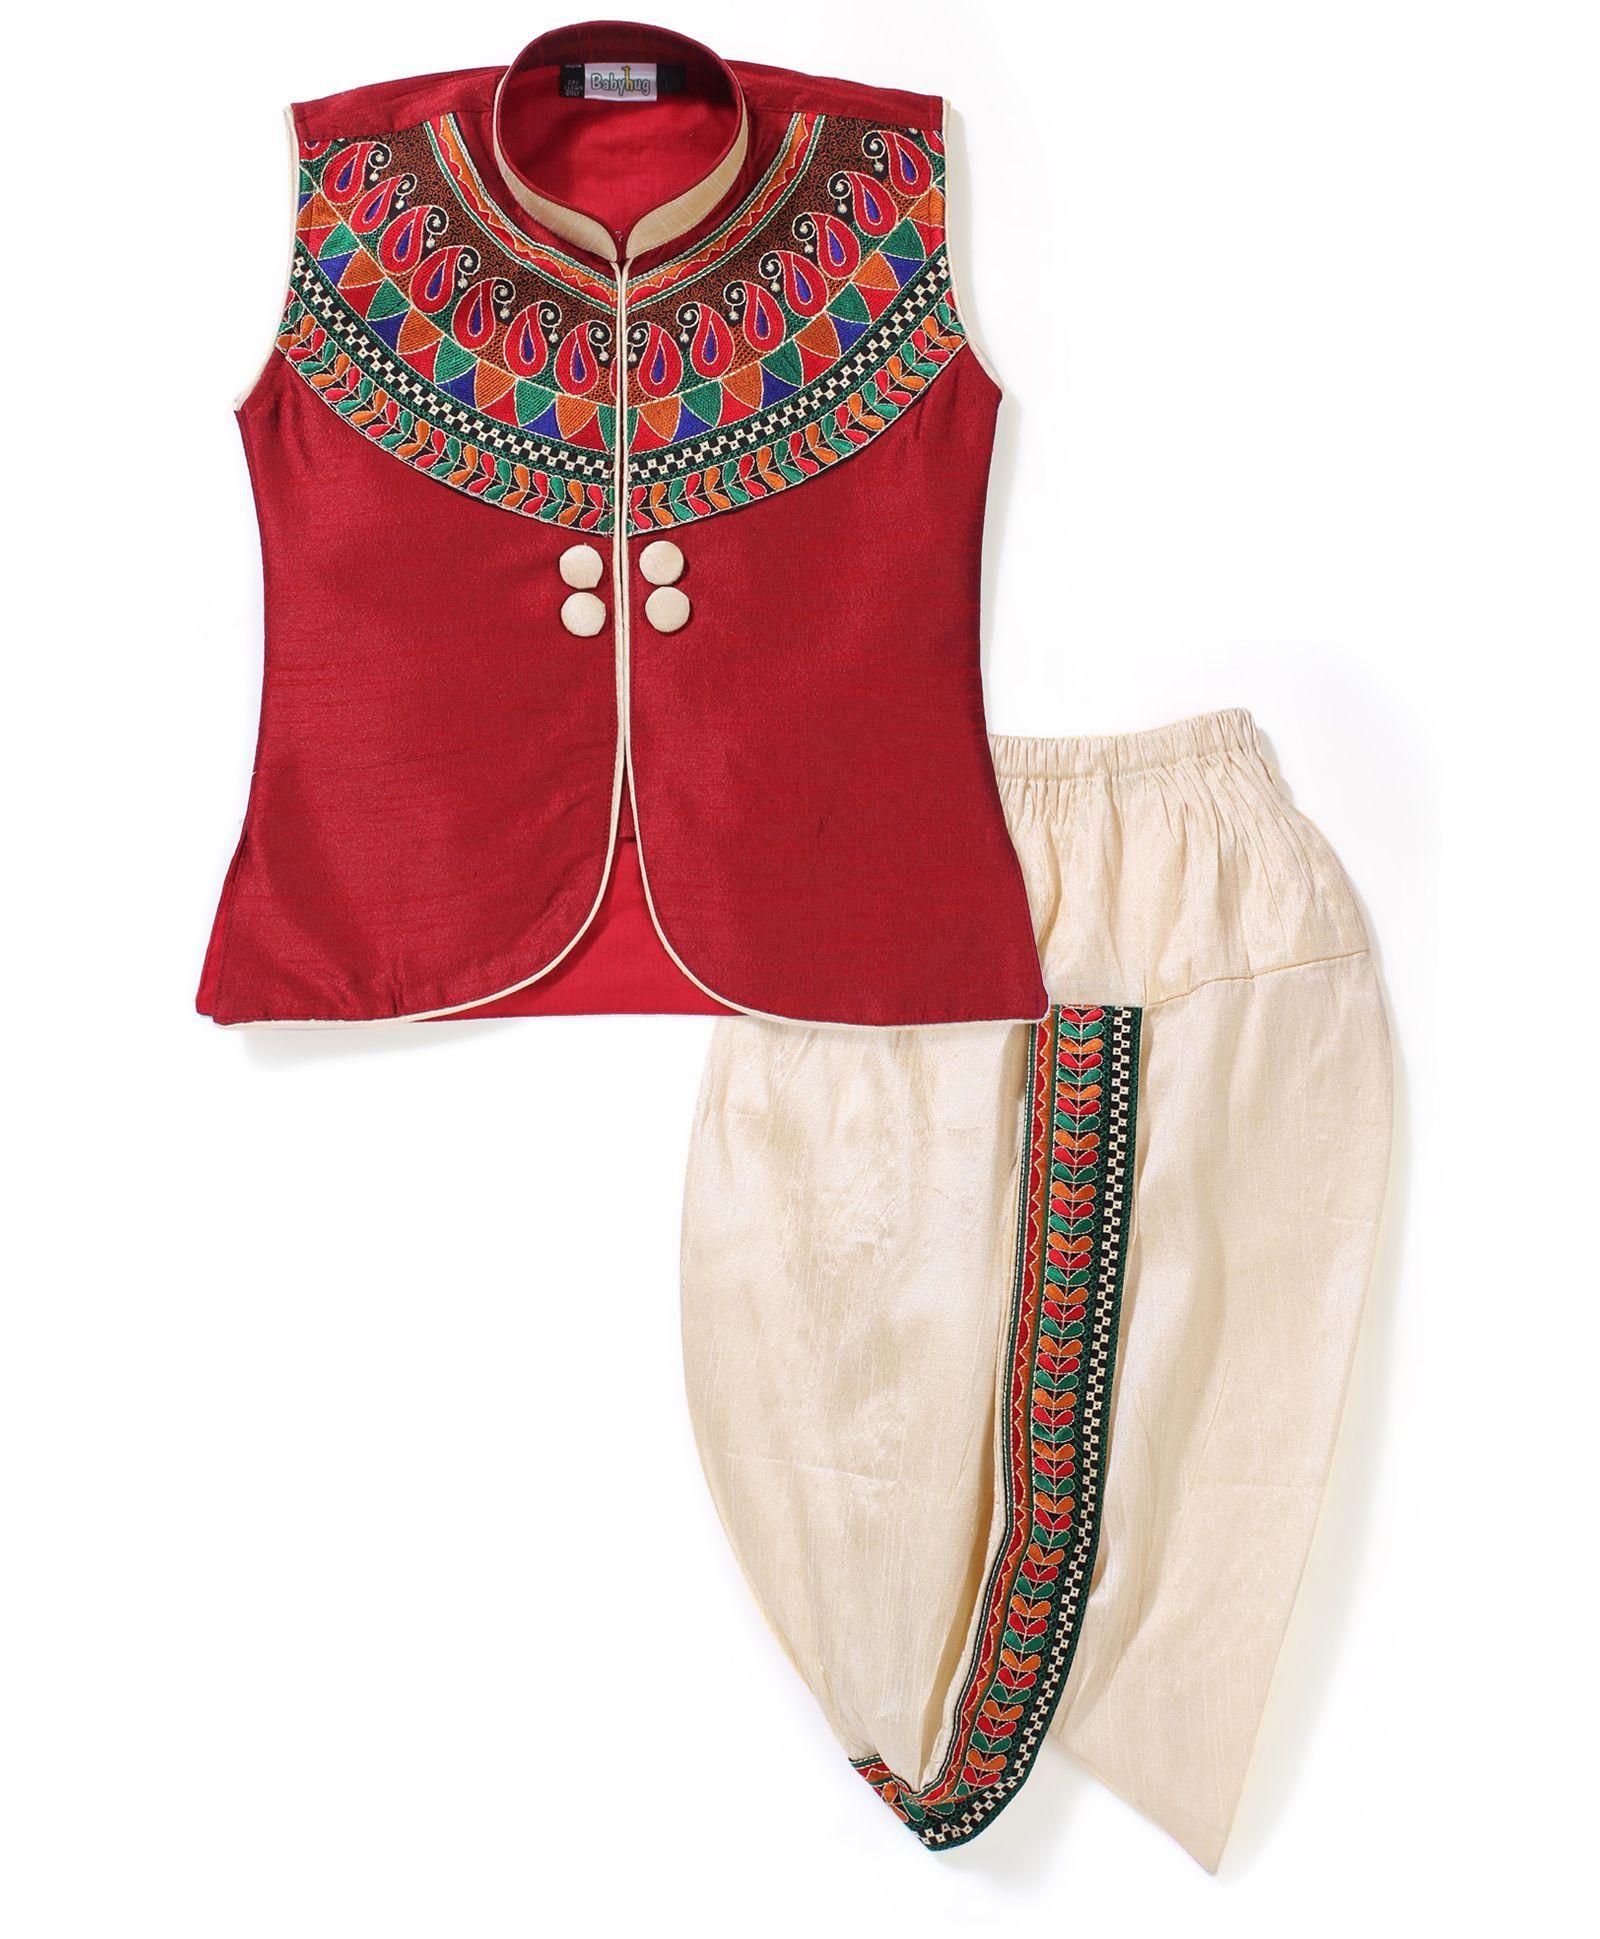 53b3666dc Buy Babyhug Sleeveless Kurta And Dhoti Set Embroidery Maroon   Cream ...